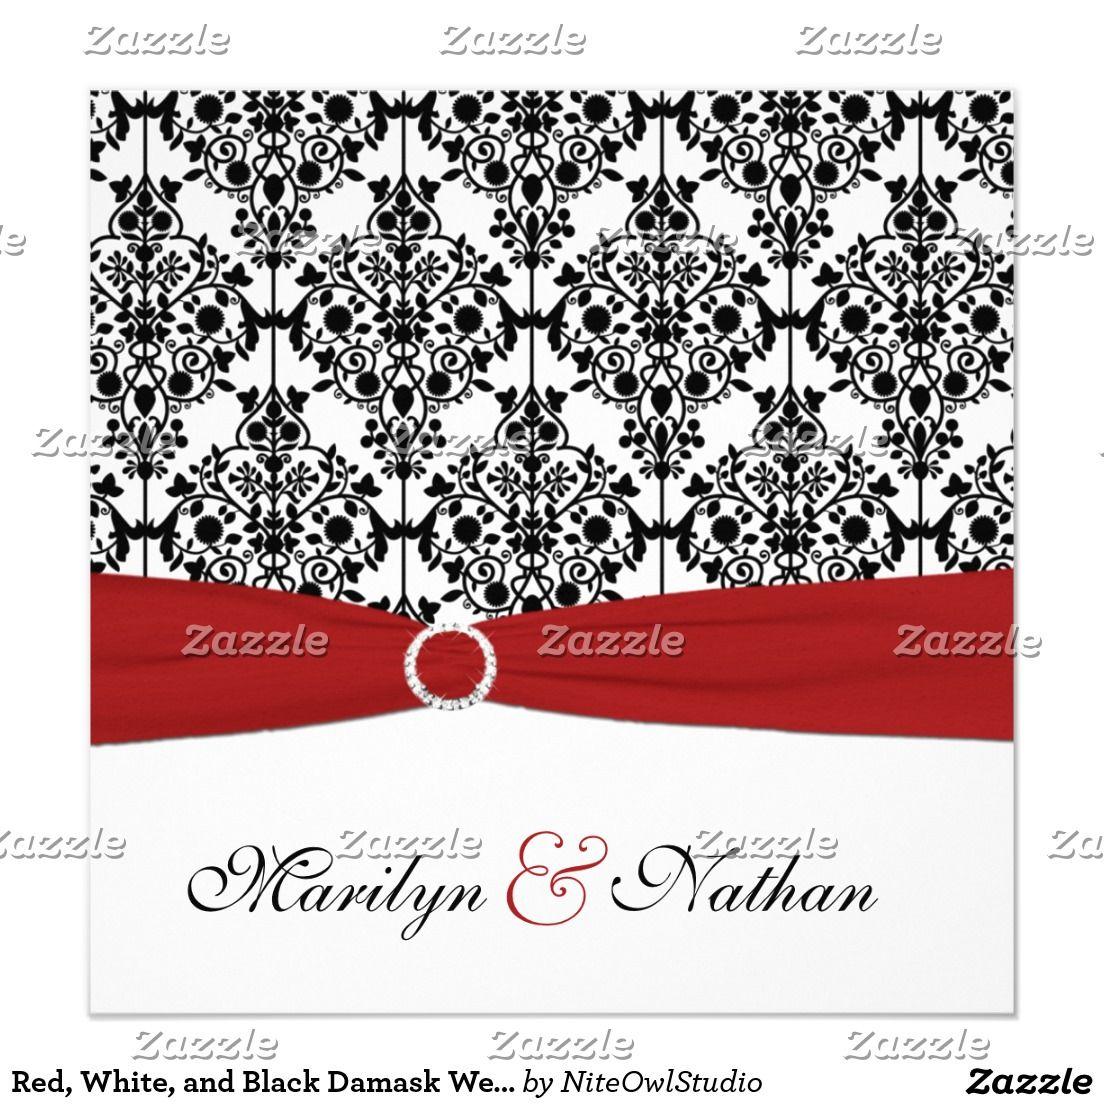 Red, White, and Black Damask Wedding Invitation | Summer wedding ...